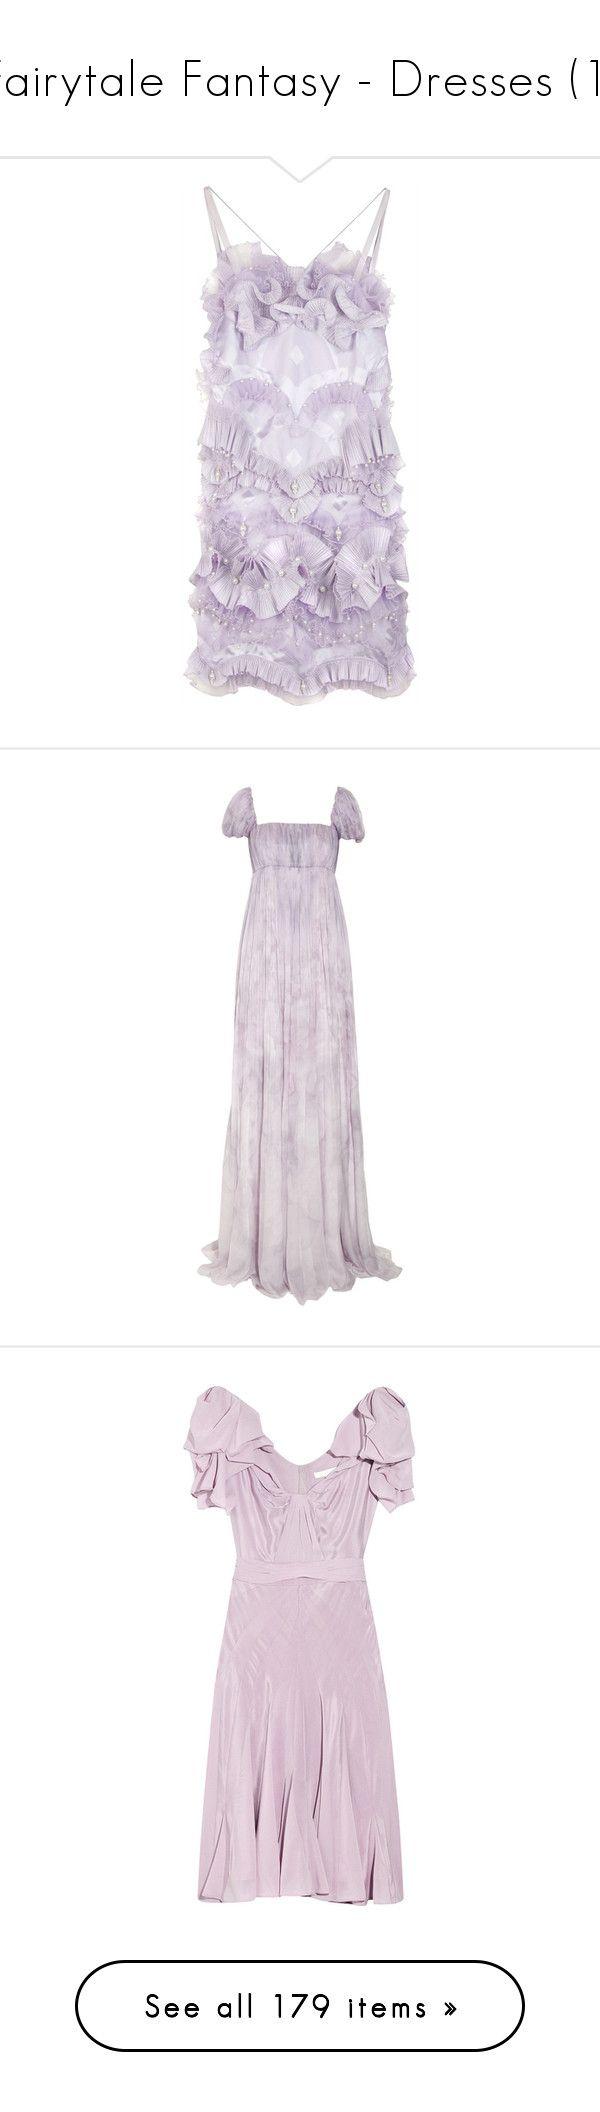 """Fairytale Fantasy - Dresses (1)"" by metalheavy ❤ liked on Polyvore featuring dresses, vestidos, purple, haljine, women, purple summer dresses, summer cocktail dresses, purple dress, frilly dresses and pleated dress"